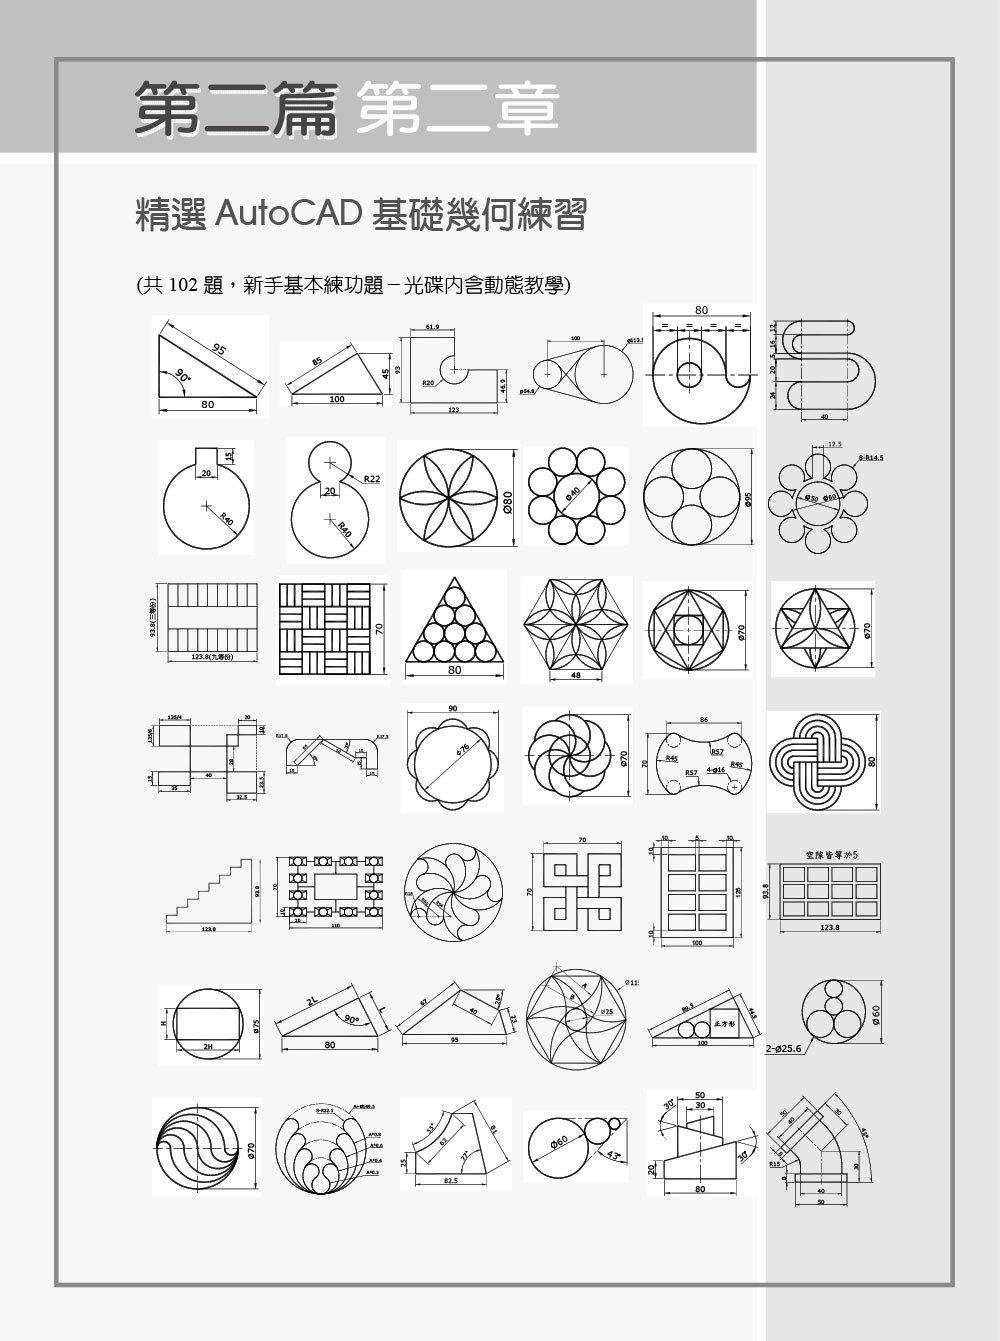 TQC+ AutoCAD 2021 特訓教材 -- 基礎篇 (隨書附贈102個精彩繪圖心法動態教學檔)-preview-7